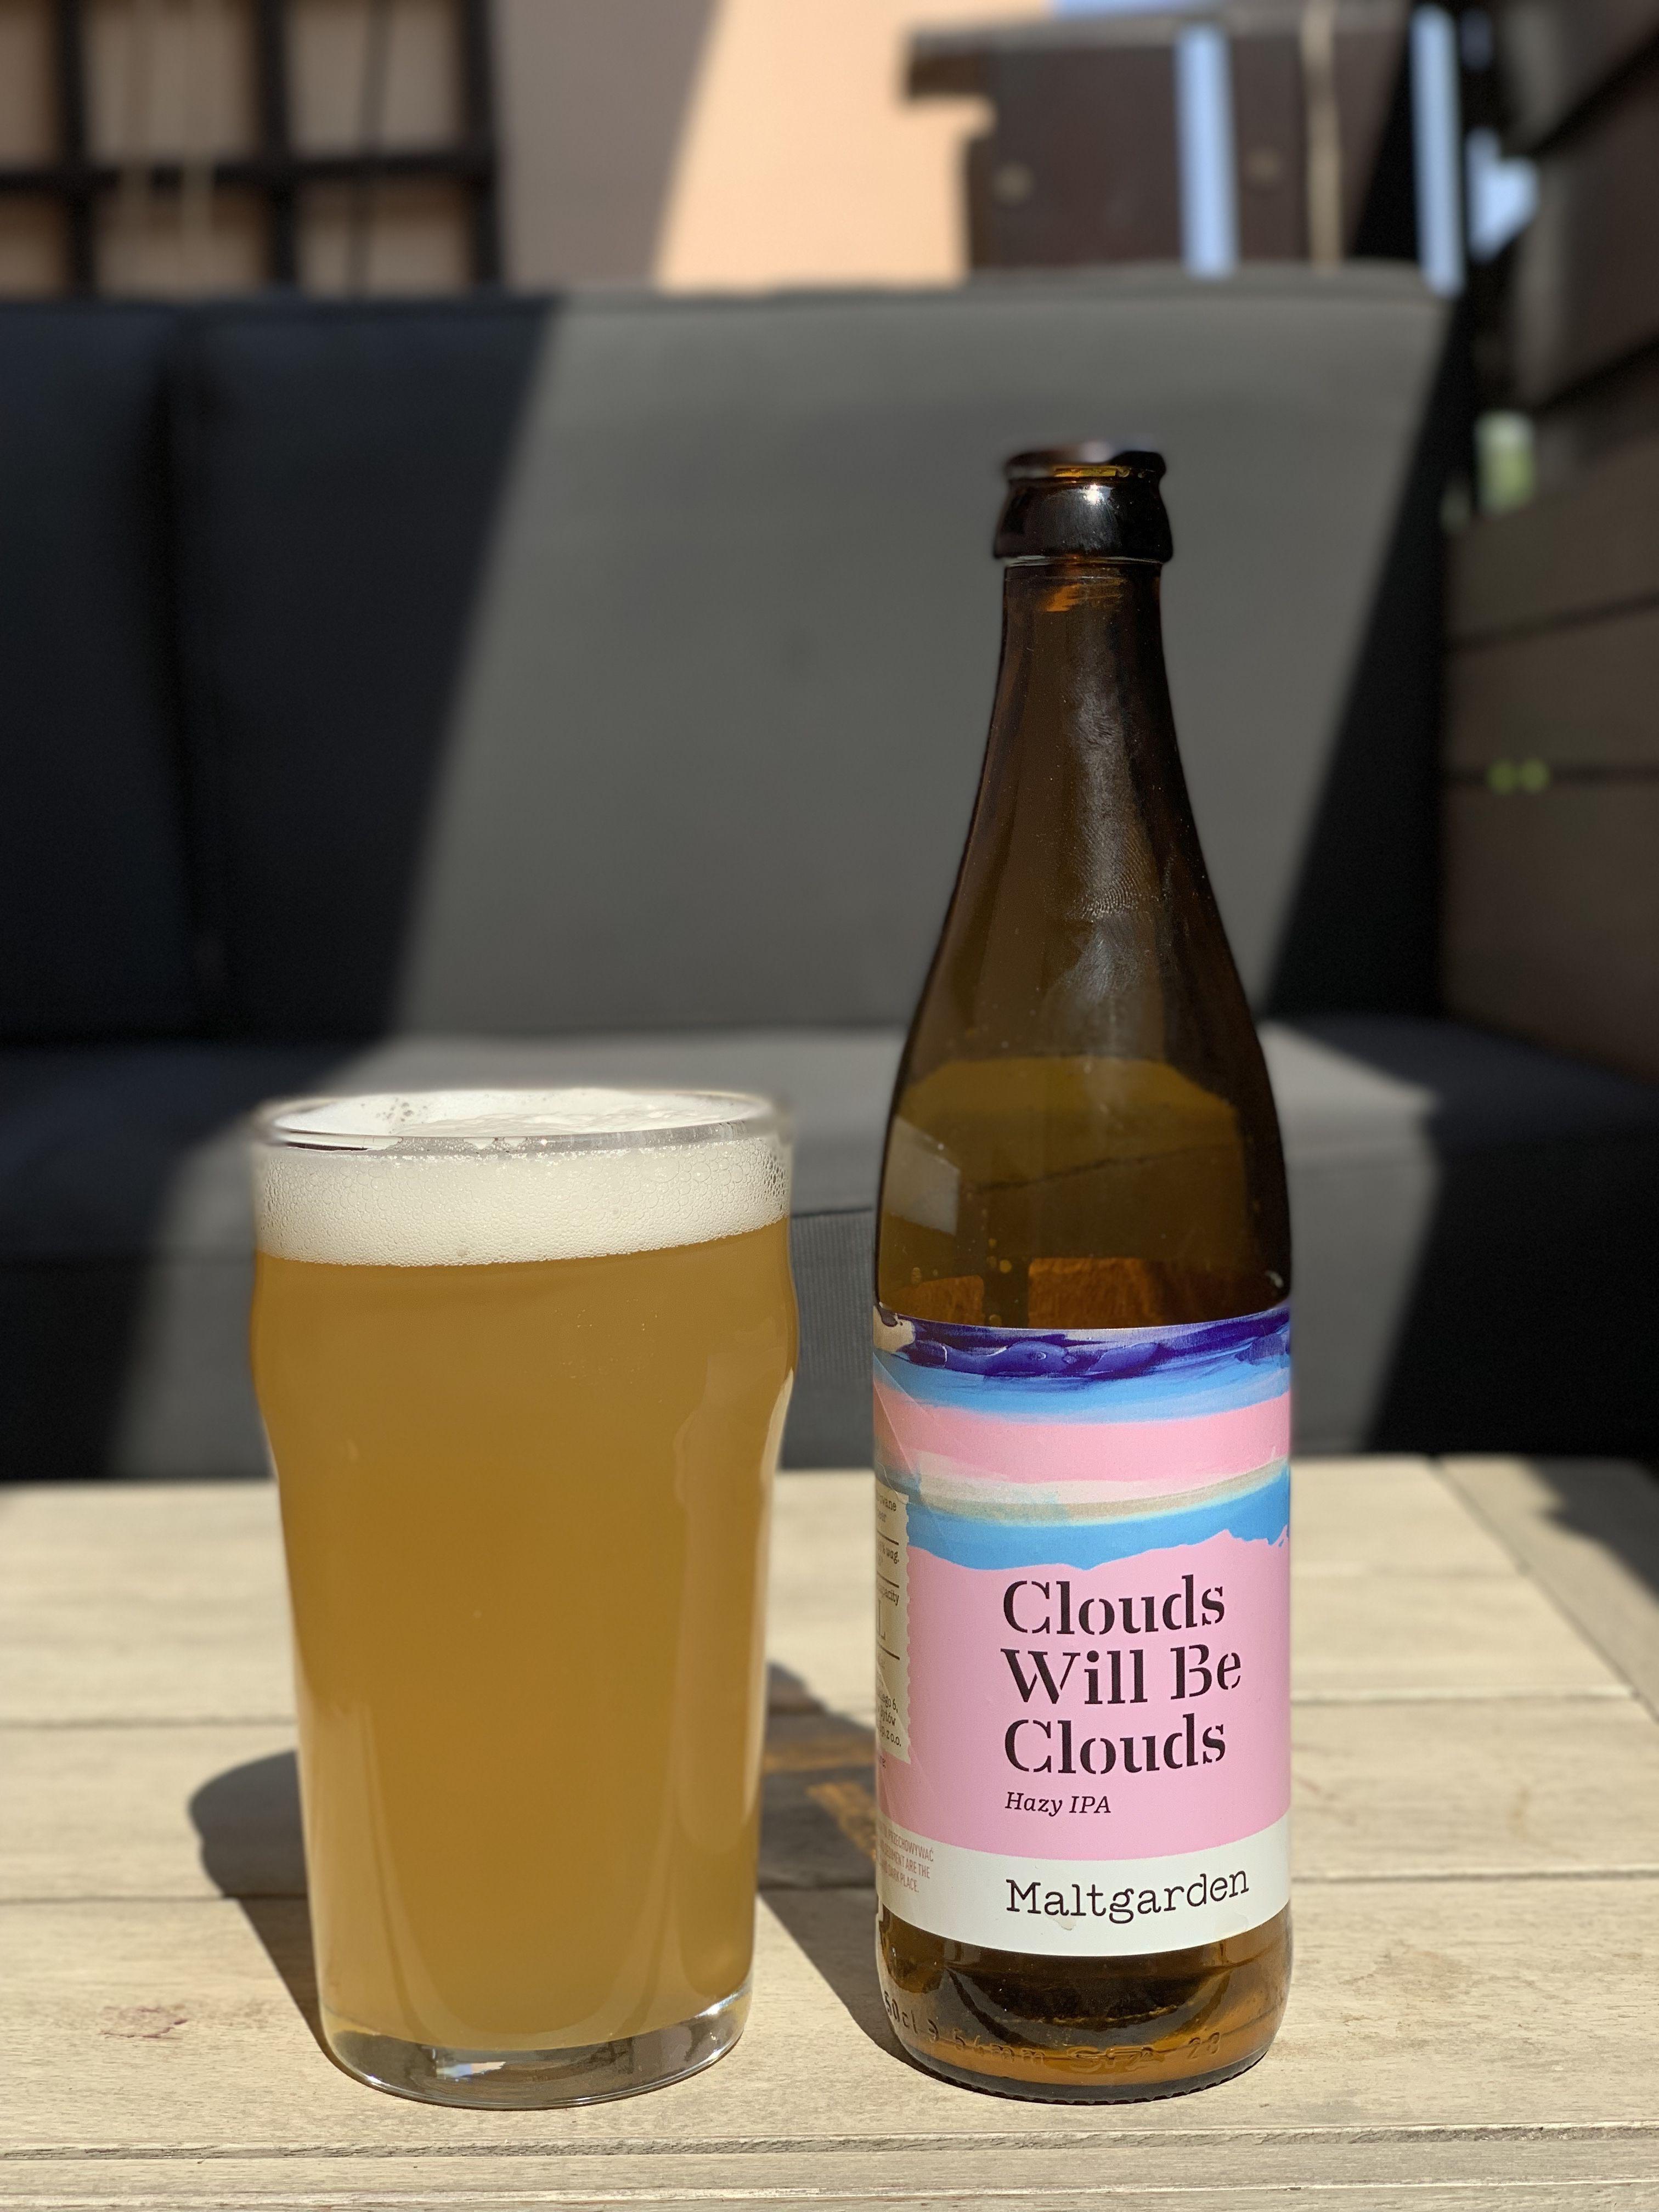 Clouds Will Be Clouds Hazy Ipa Browar Maltgarden 2019 05 01